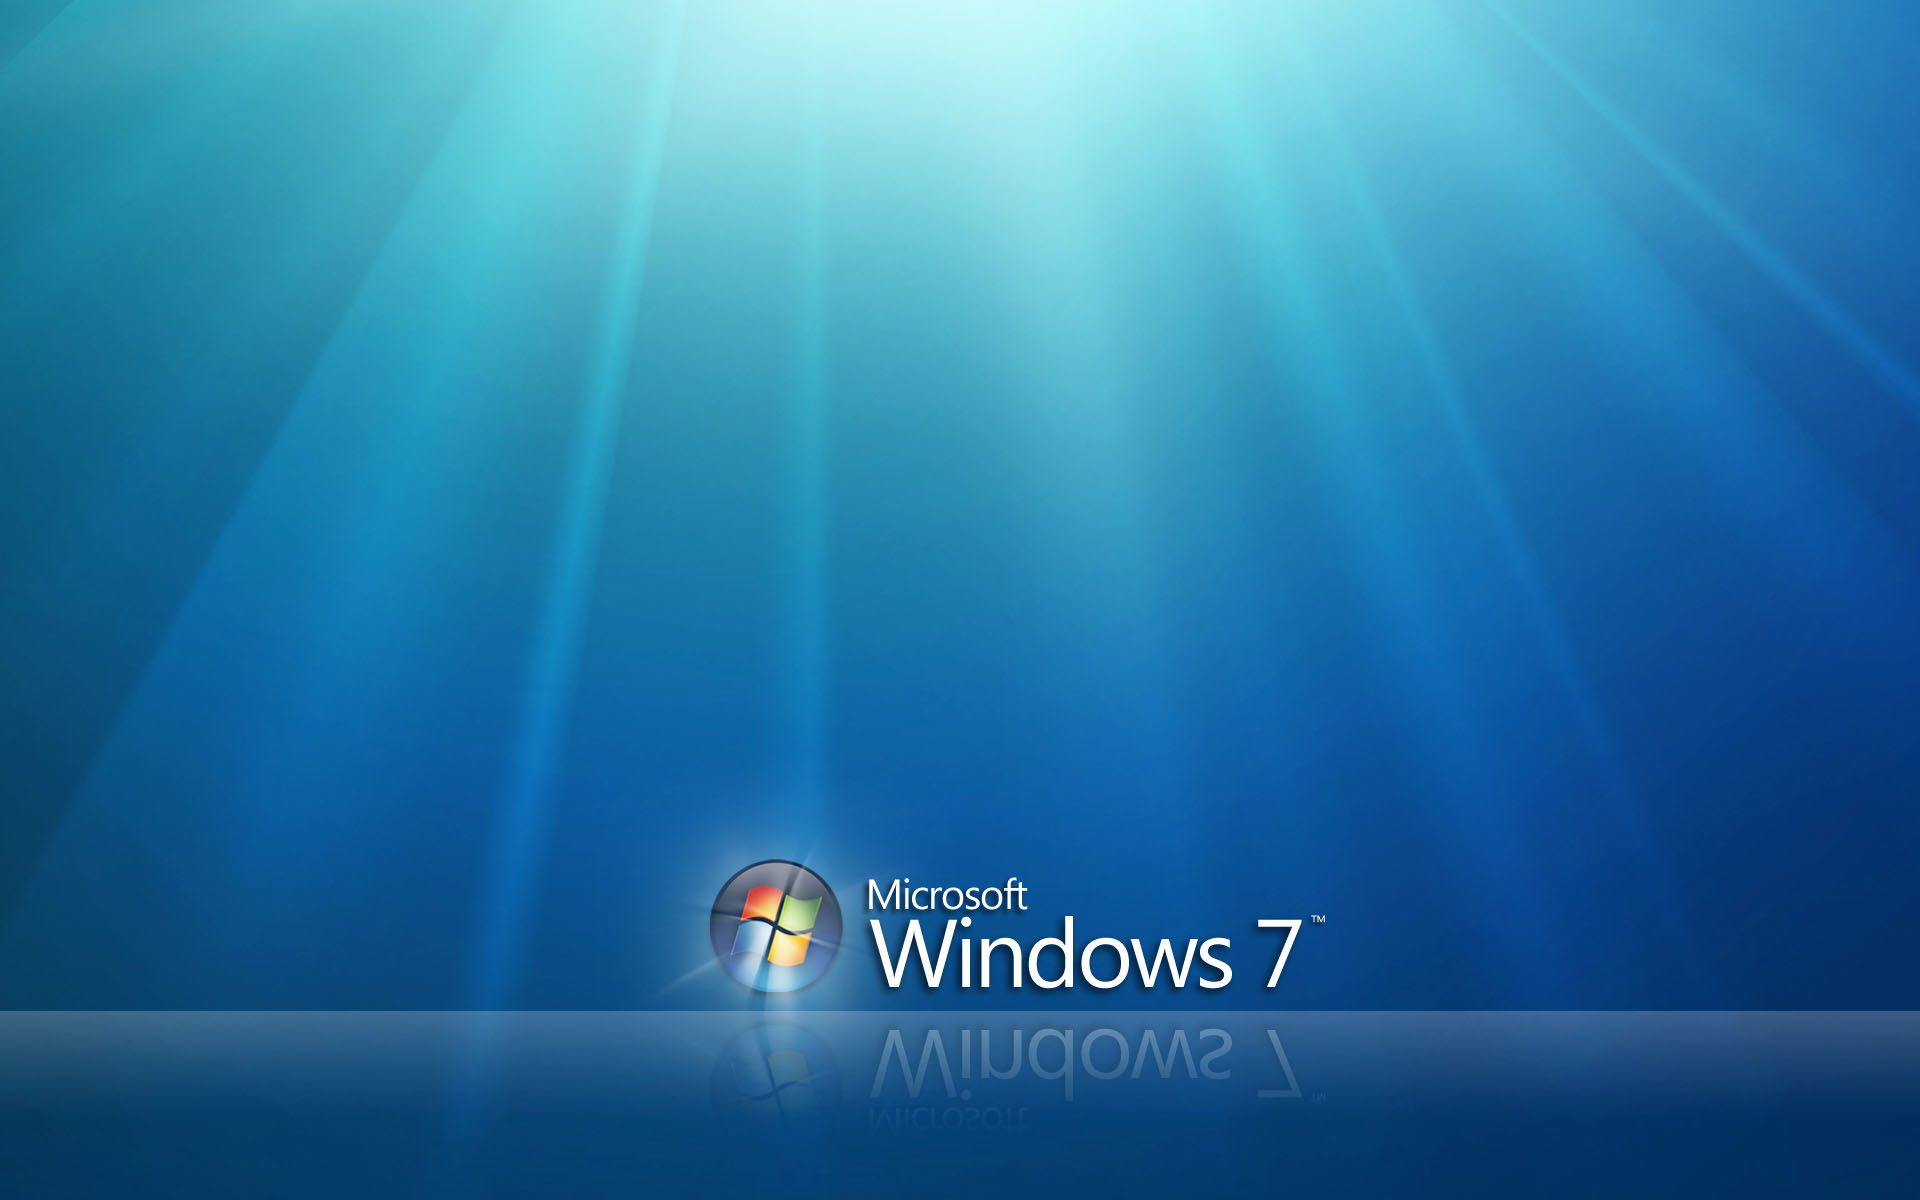 Windows 7 Hd Wallpaper Background Image 1920x1200 Id 69172